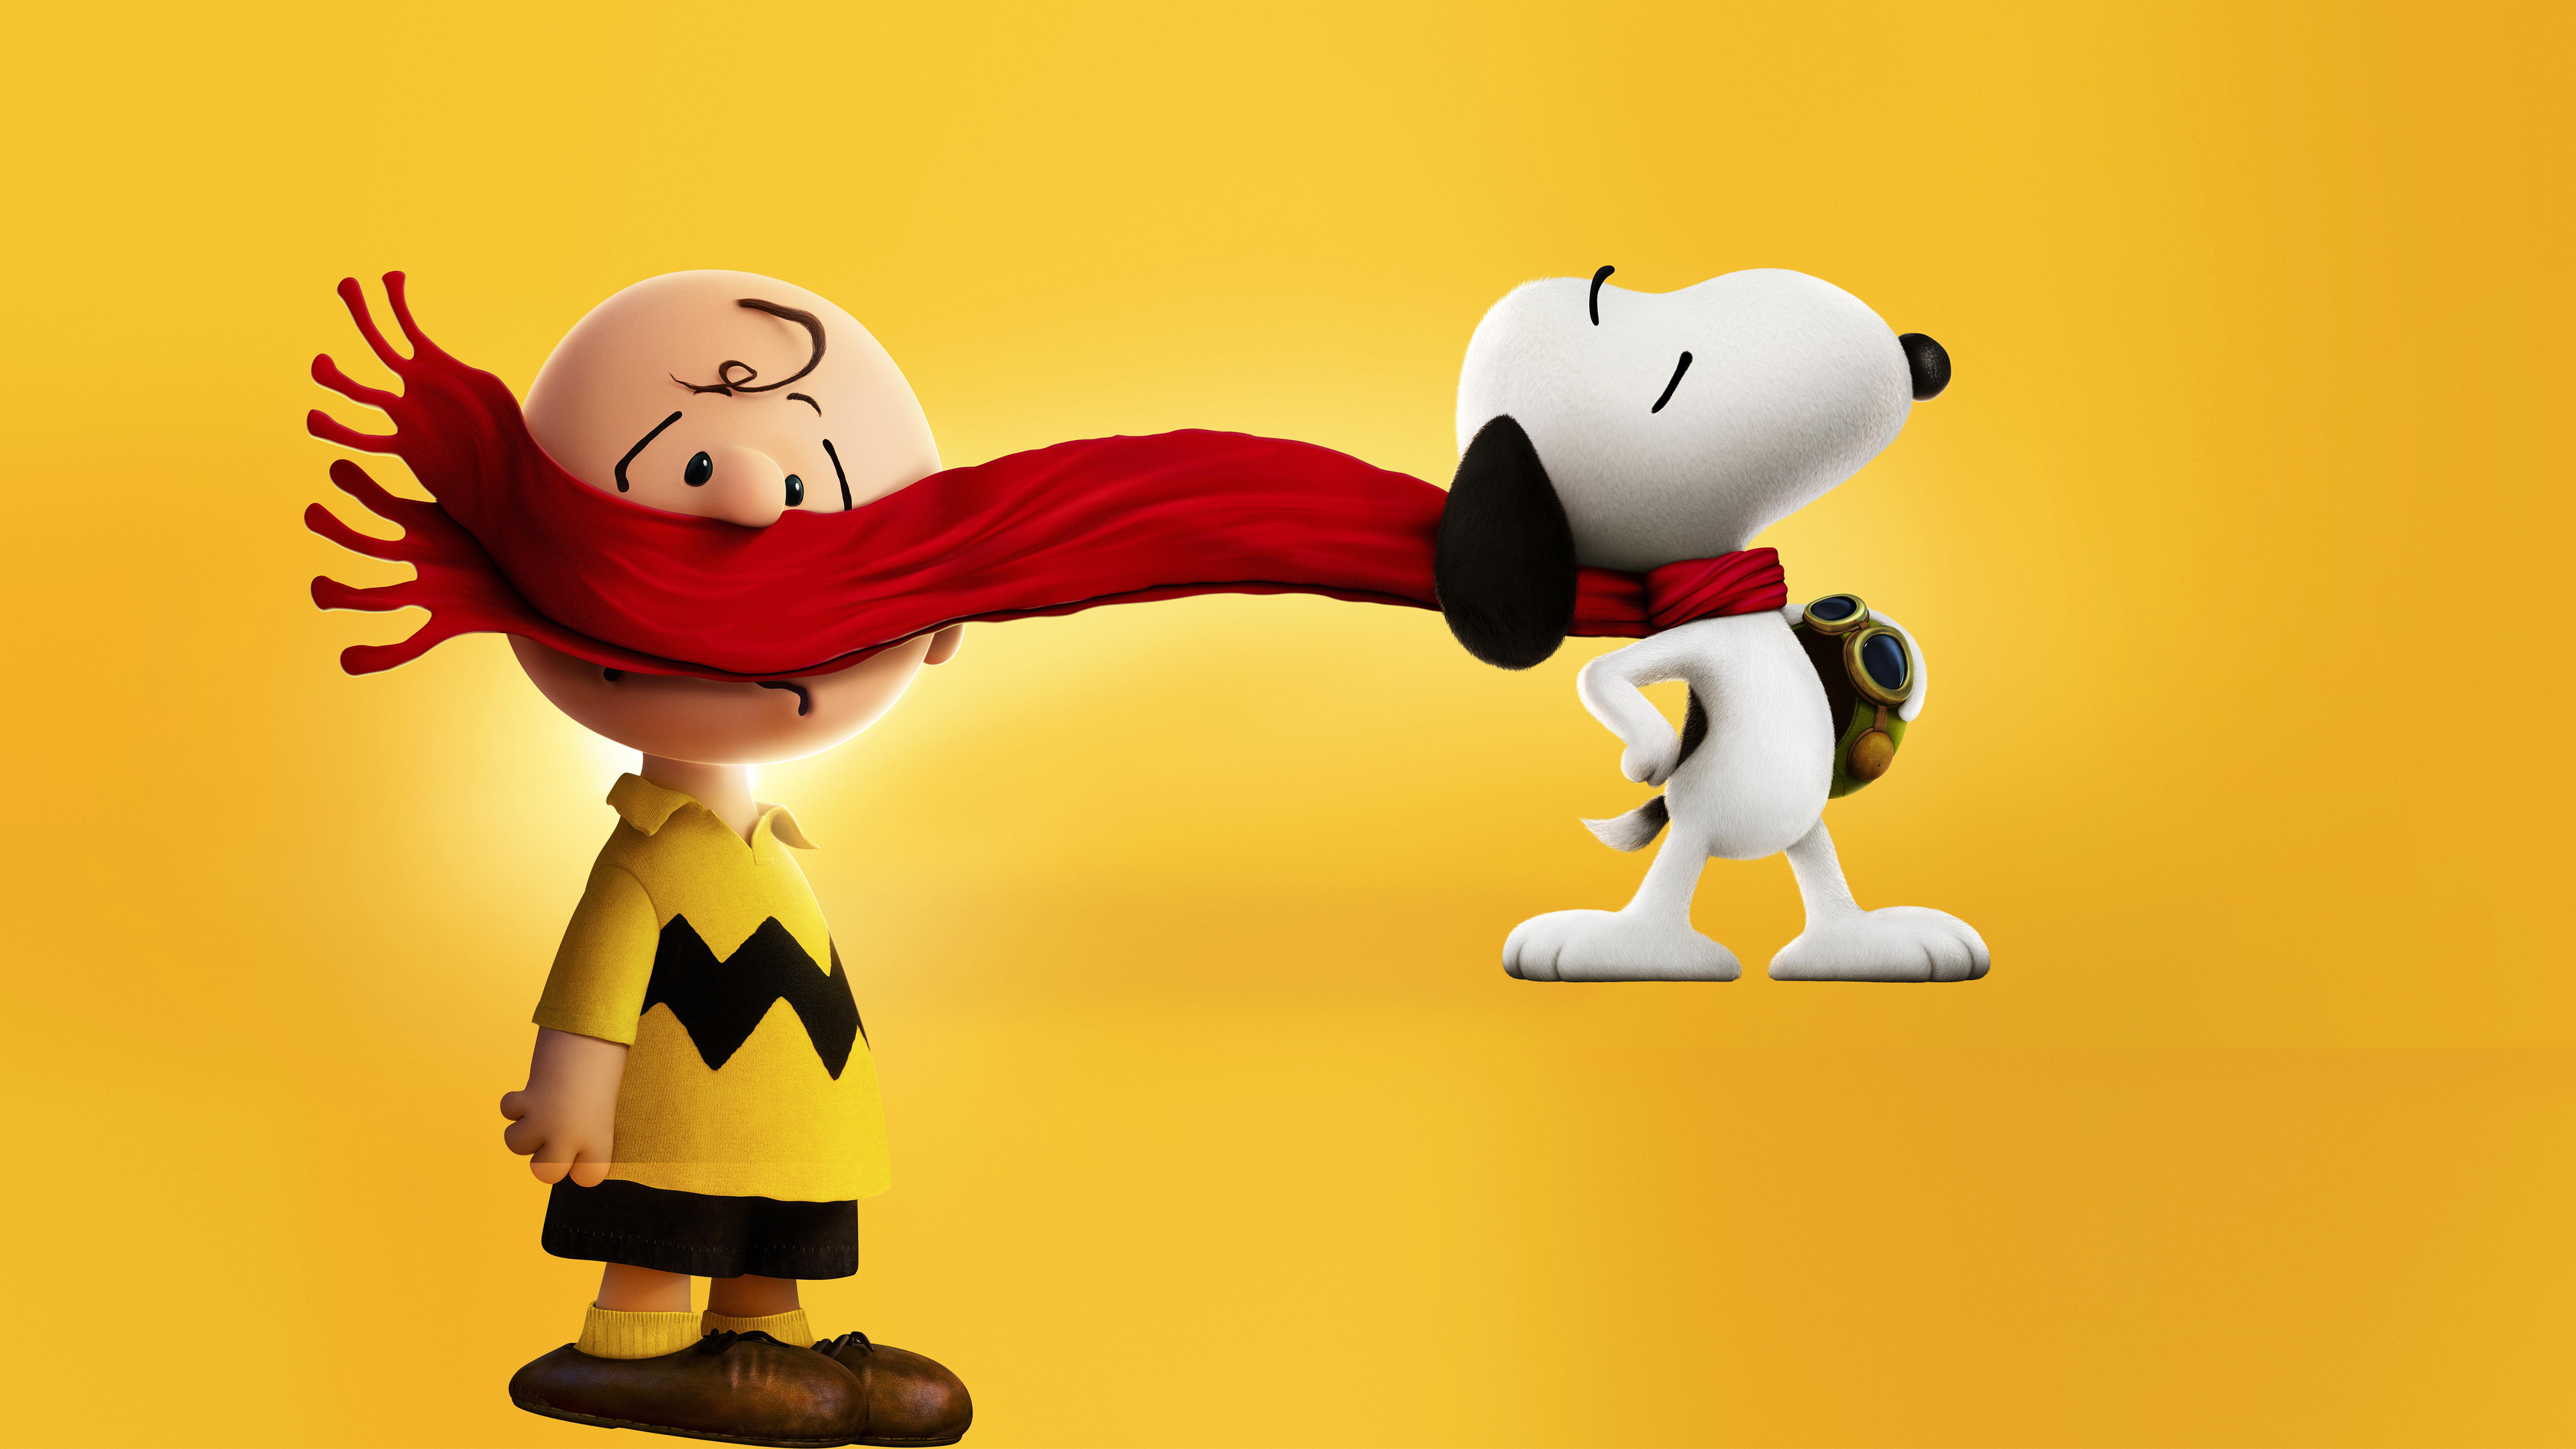 A Charlie Brown Christmas wallpaper Cartoon wallpapers | Wallpapers 4k |  Pinterest | Charlie brown, Snoopy wallpaper and Wallpaper